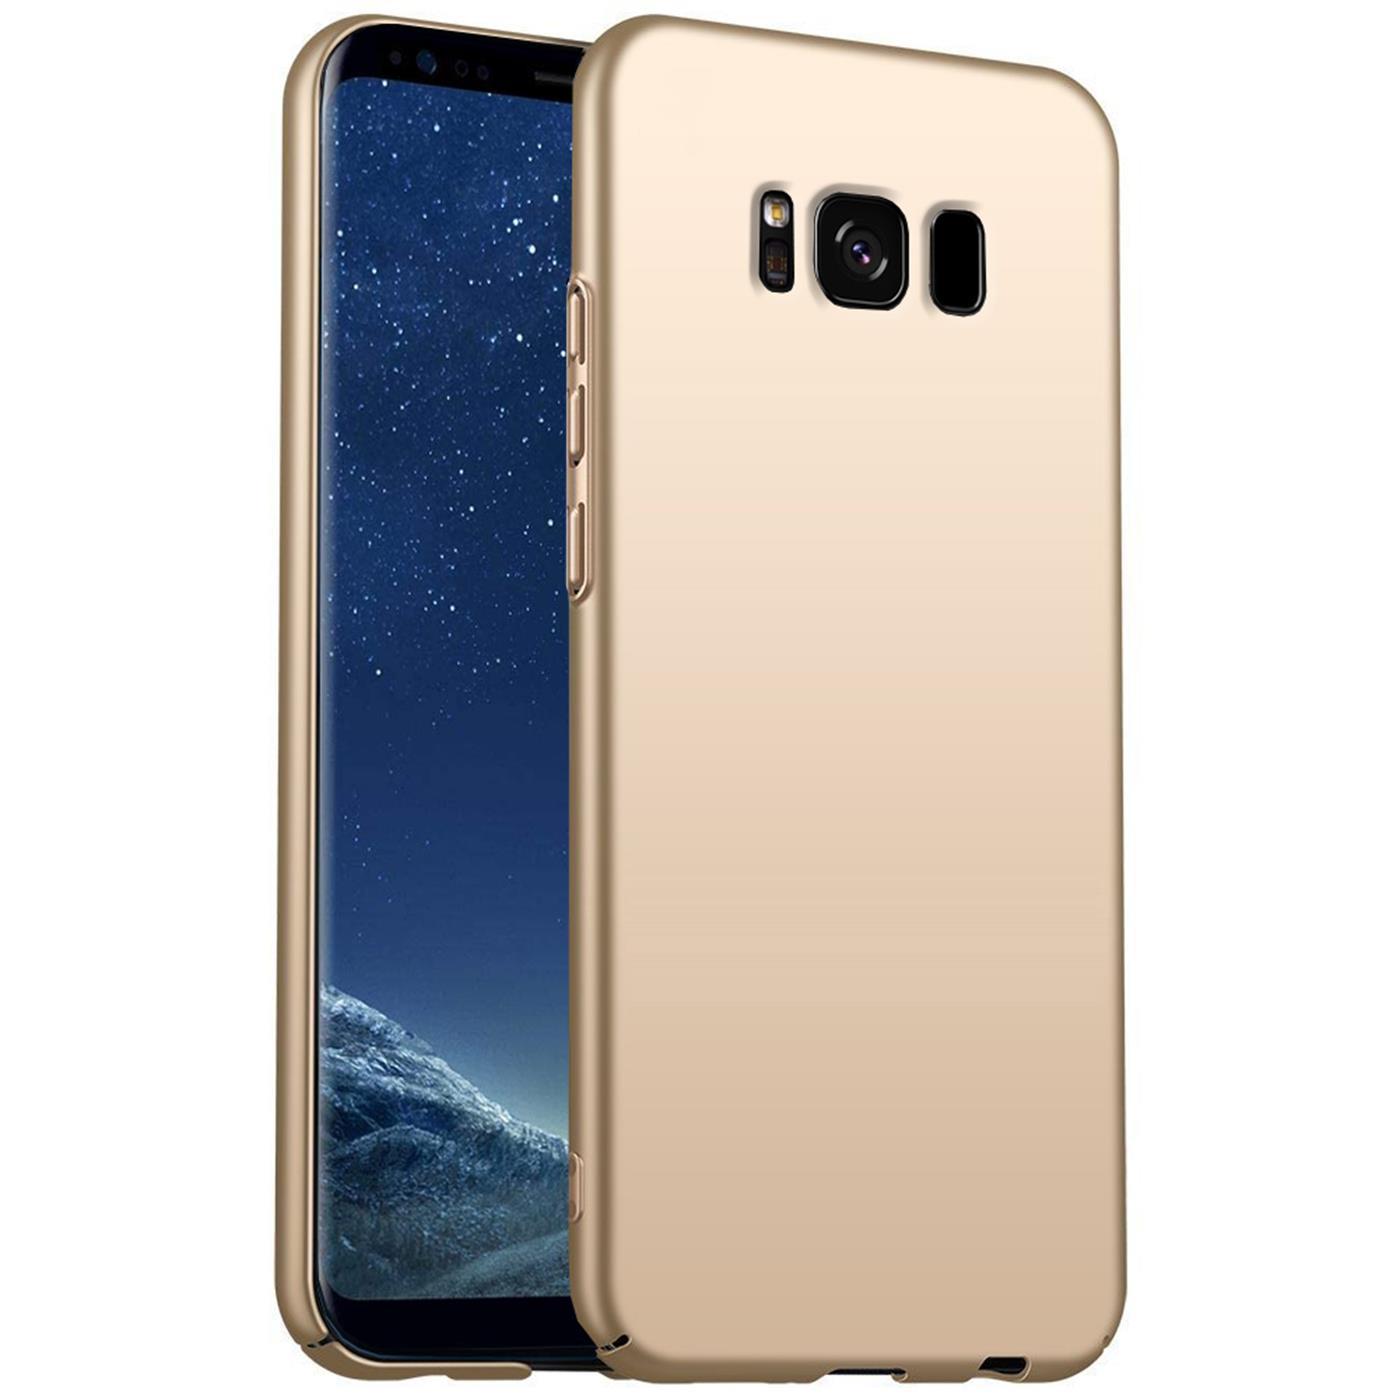 Hard-Back-Case-Cover-Samsung-Galaxy-j3-2016-duenn-Cover-Slim-Shockproof-Rugged Indexbild 14